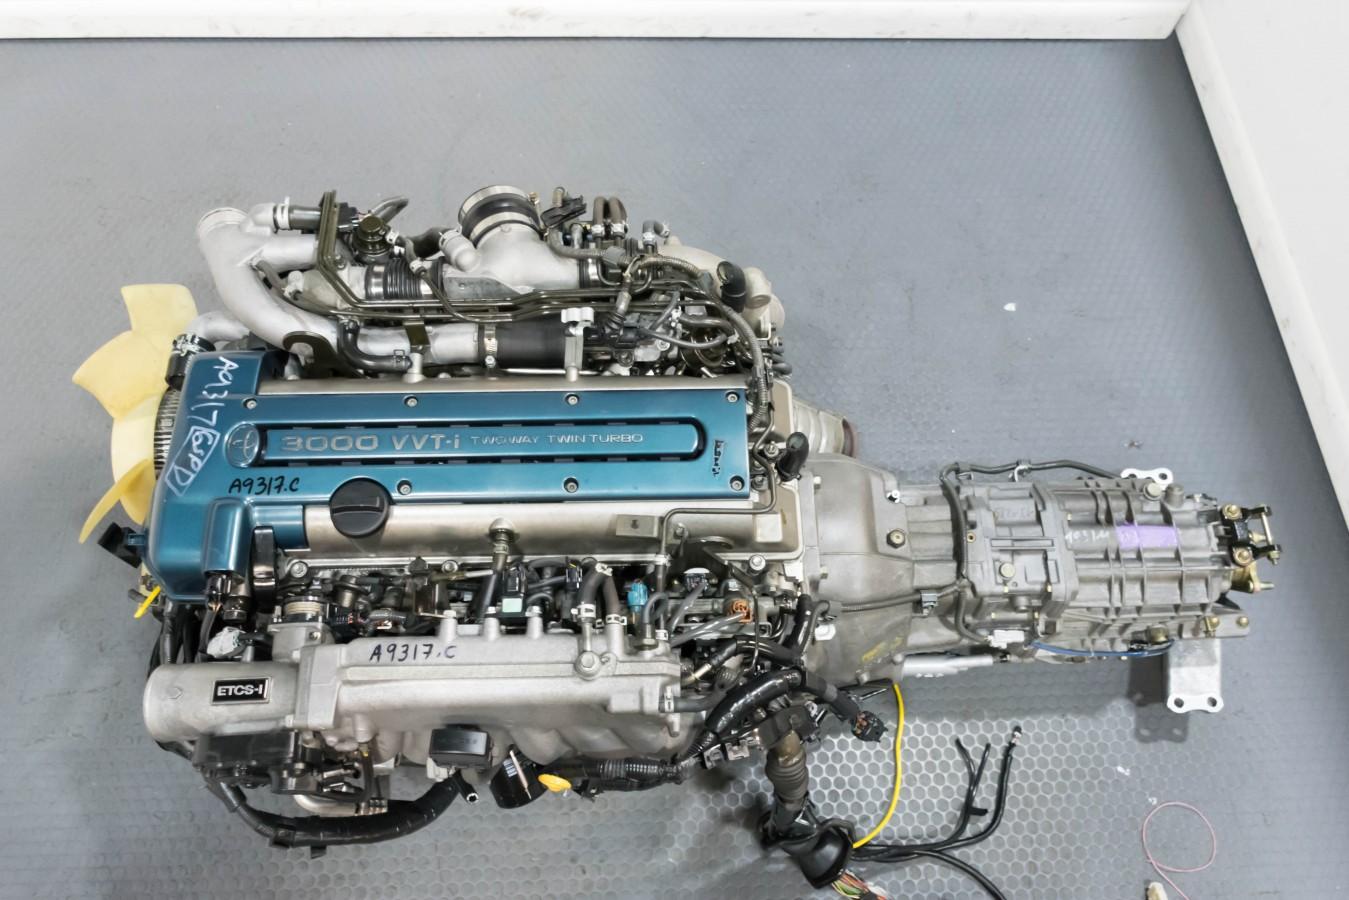 JDM Supra 2JZ-GTE Twin Turbo VVTi Engine with V161 6 Speed Trans